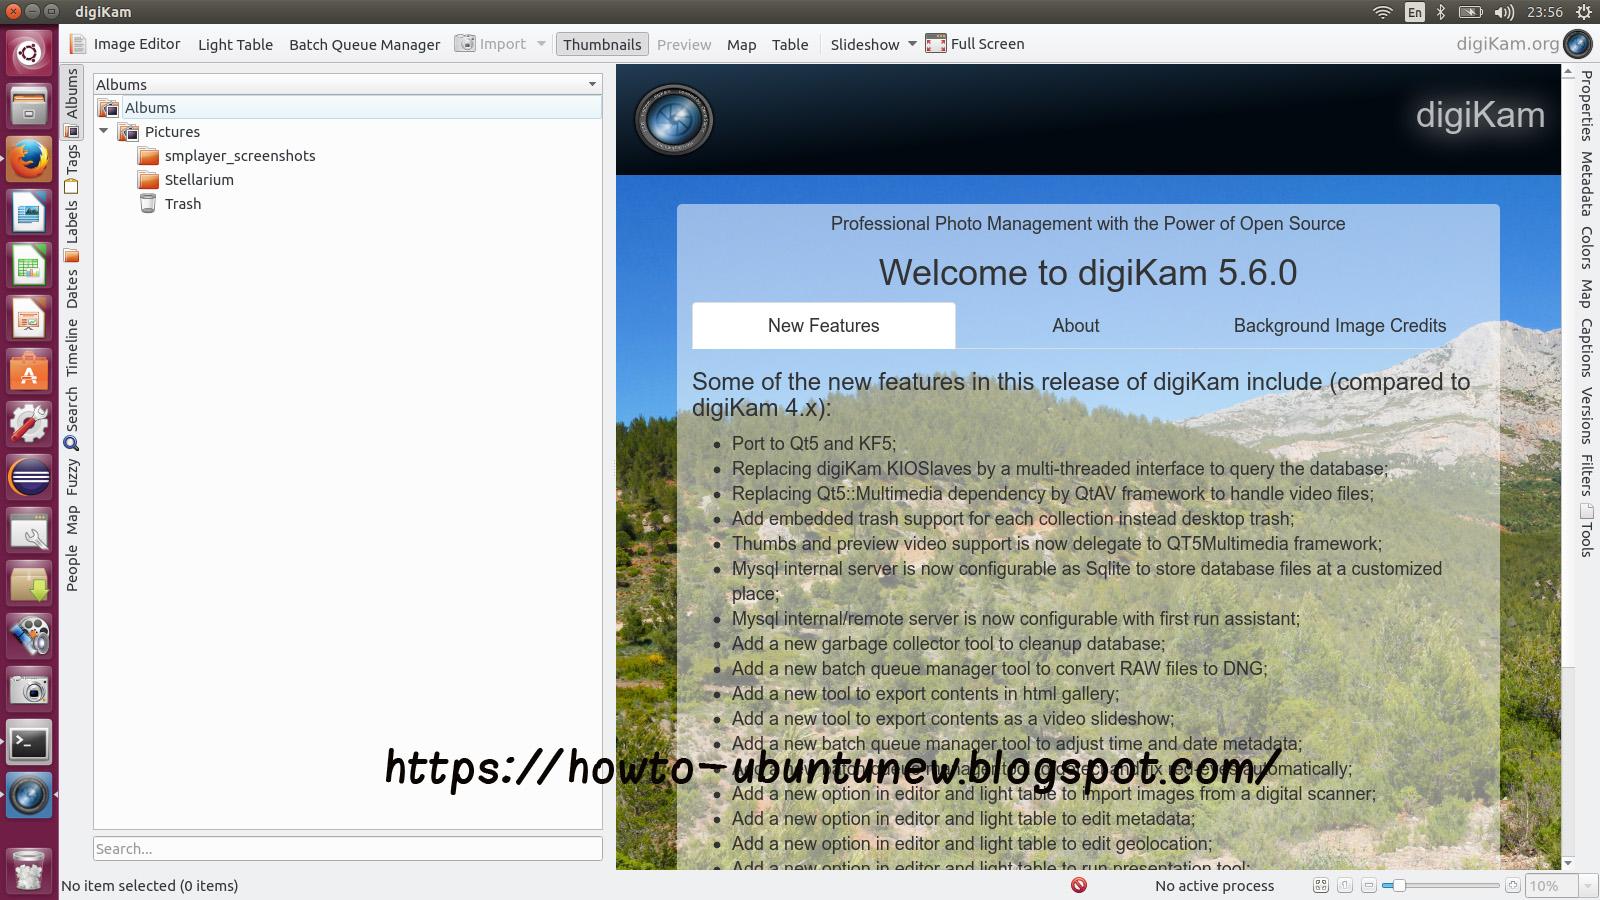 How to install program on Ubuntu: How to Install digiKam 5 6 0